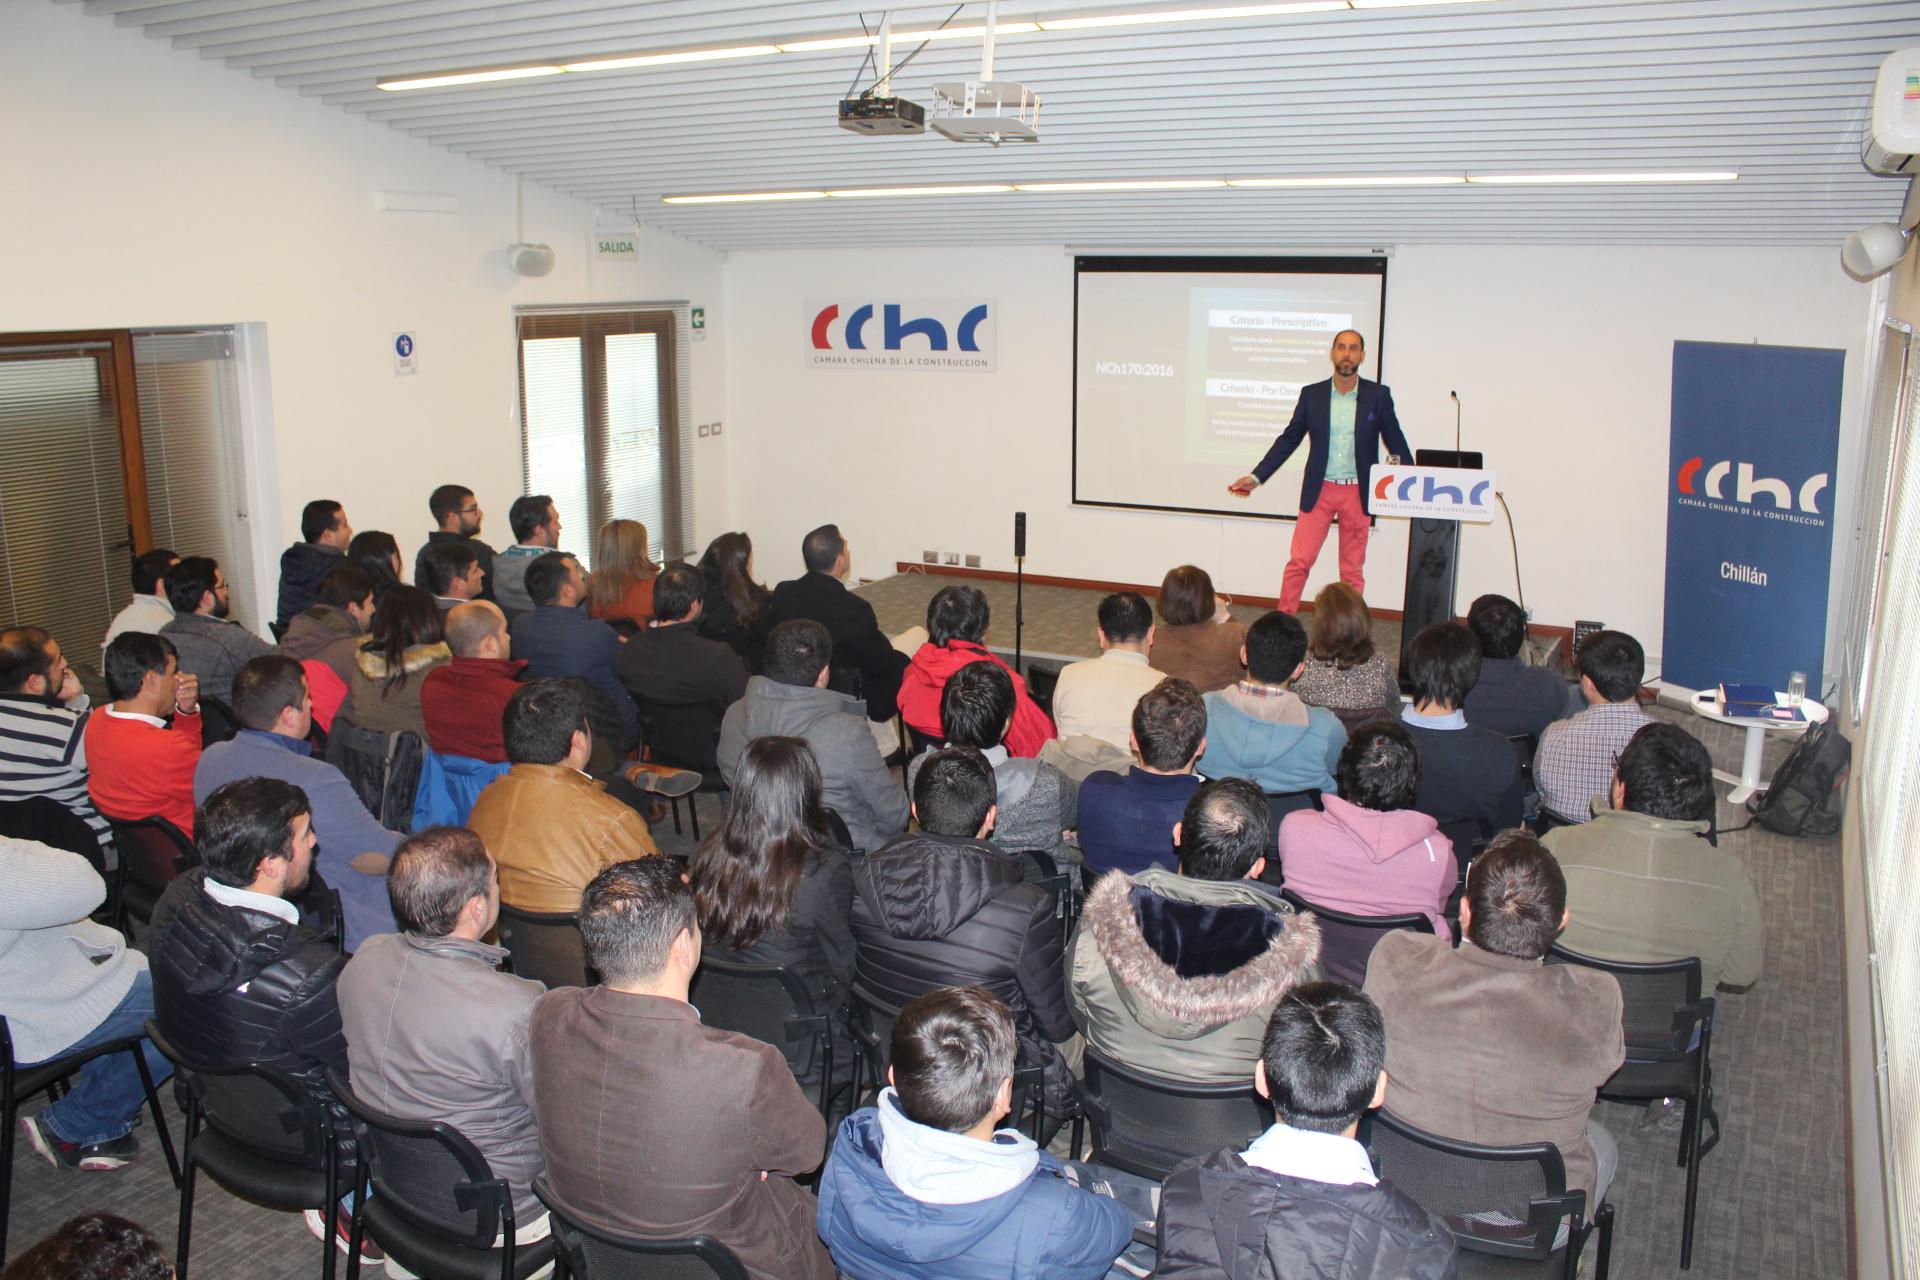 Comité de especialidades realizó seminario sobre actualización de Norma NCH 170 en Chillán noticias